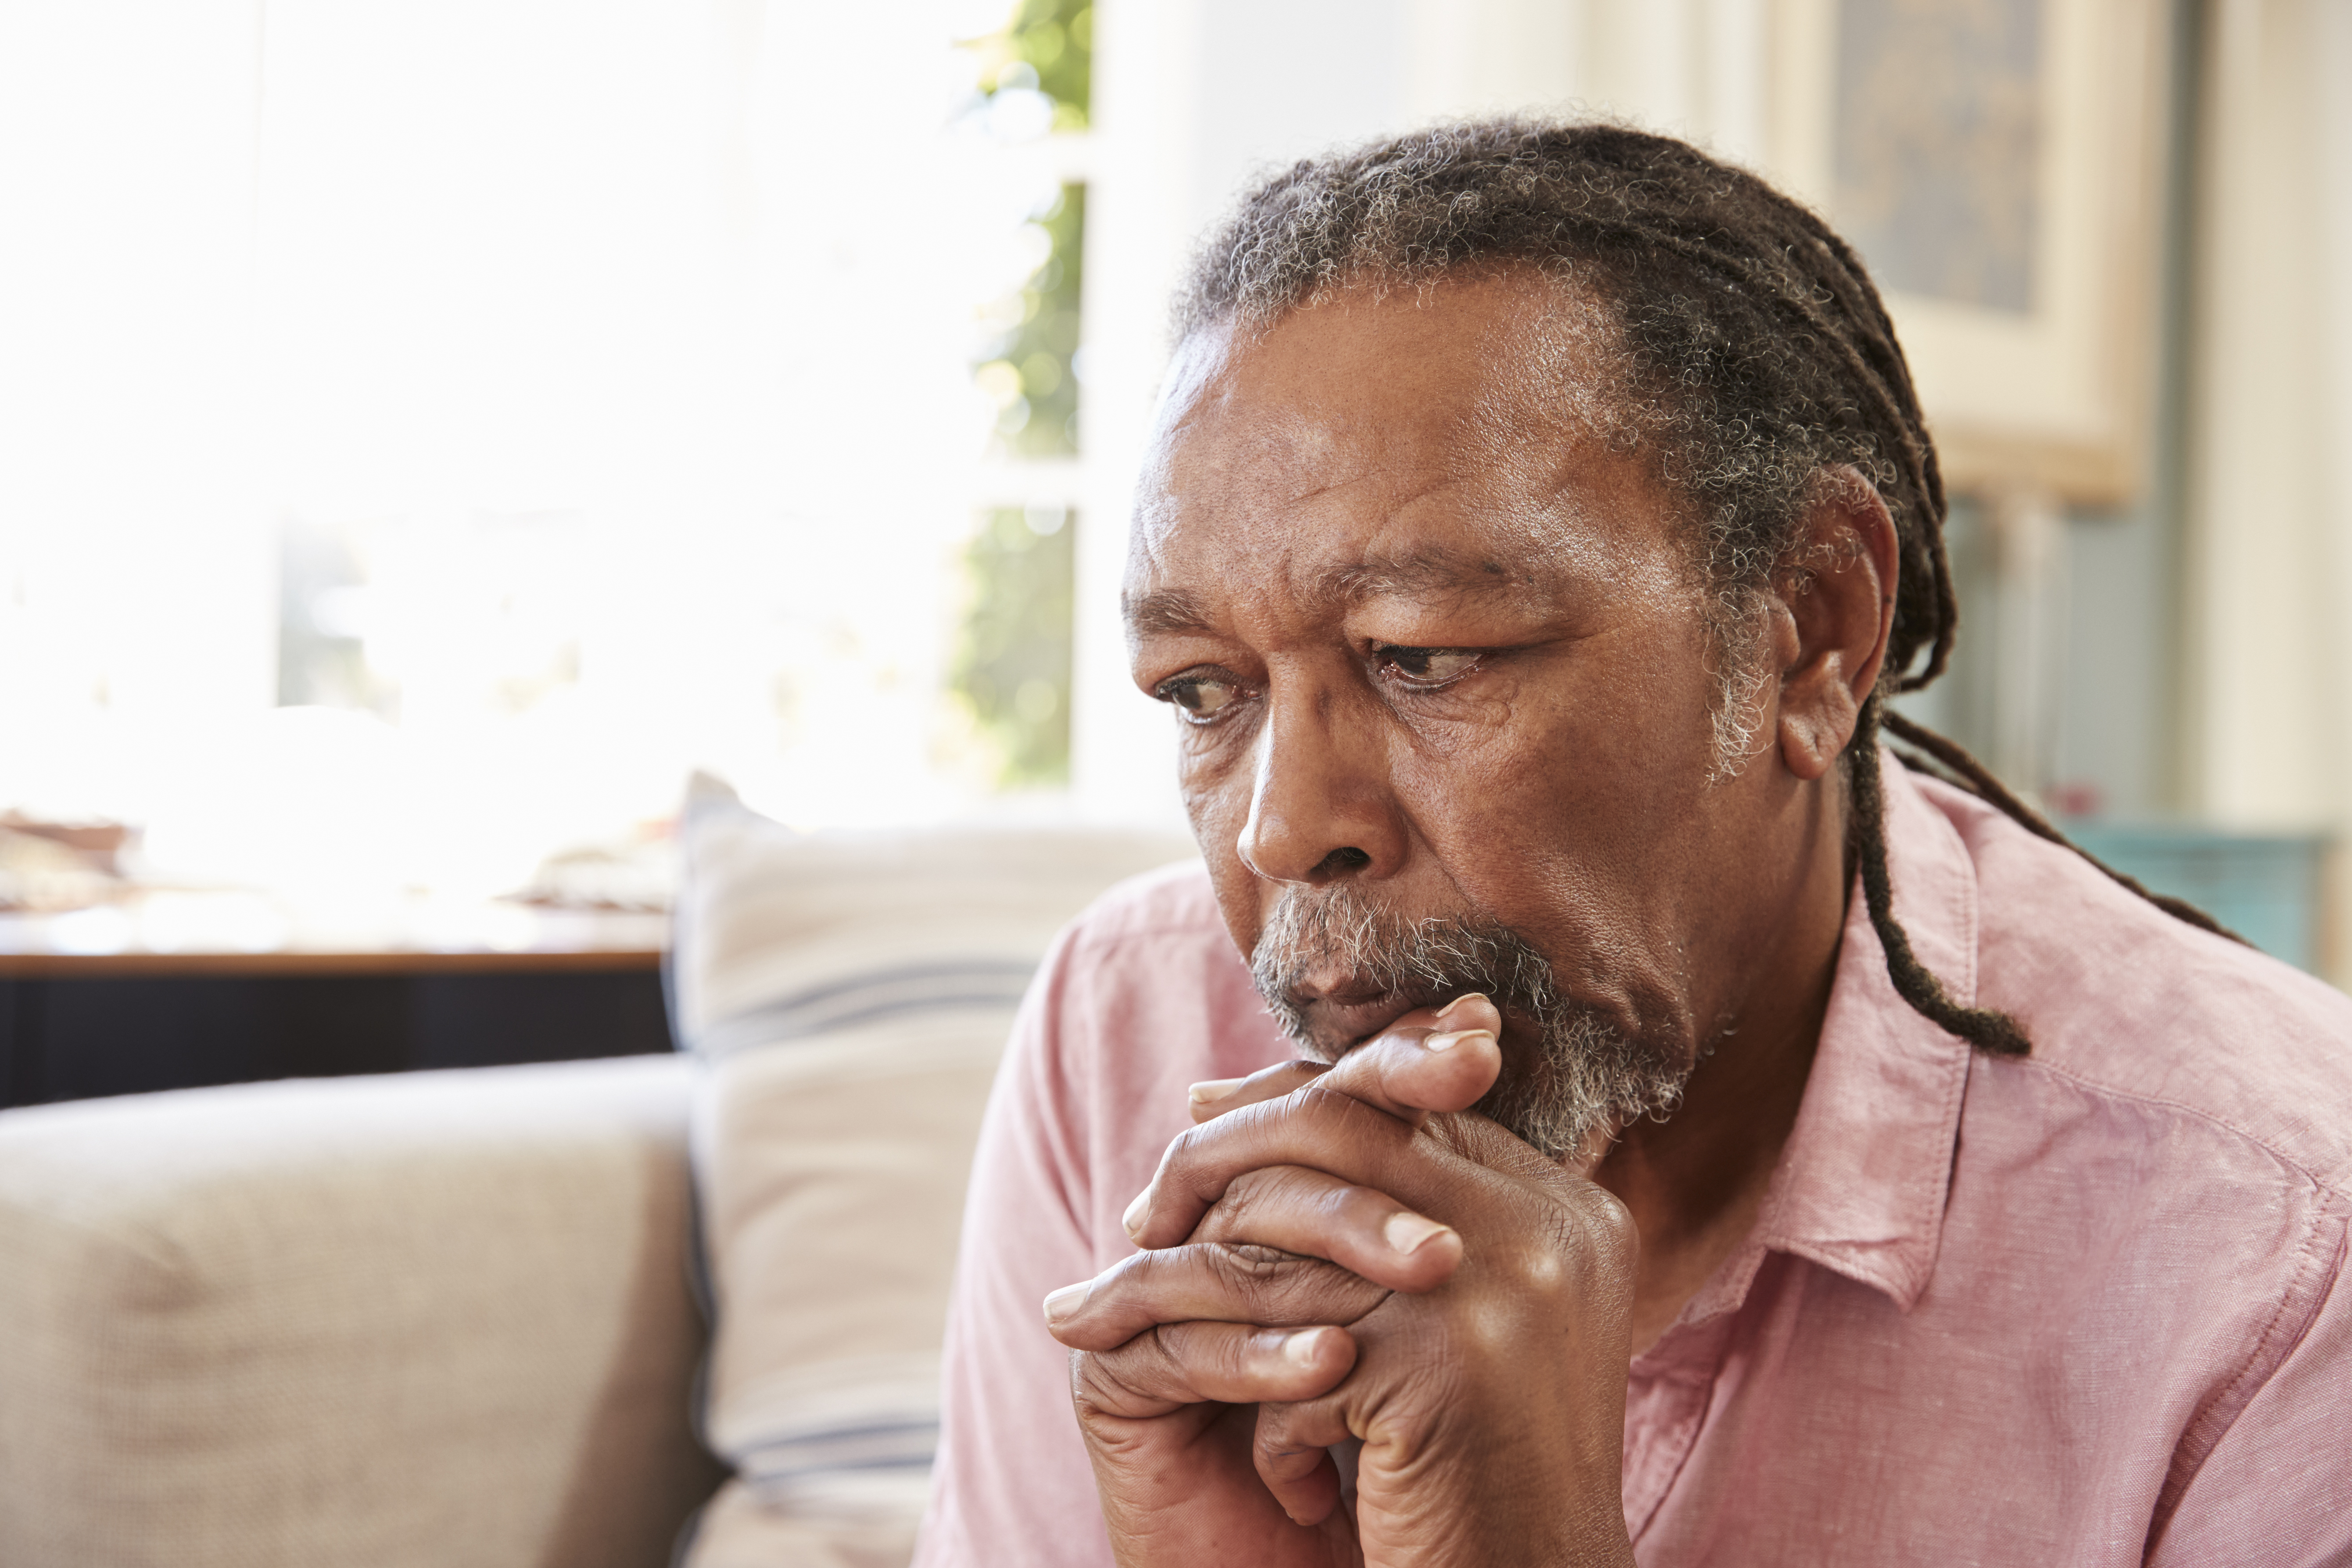 senior-man-sitting-on-sofa-at-home-suffering-from--PK6SFDJ